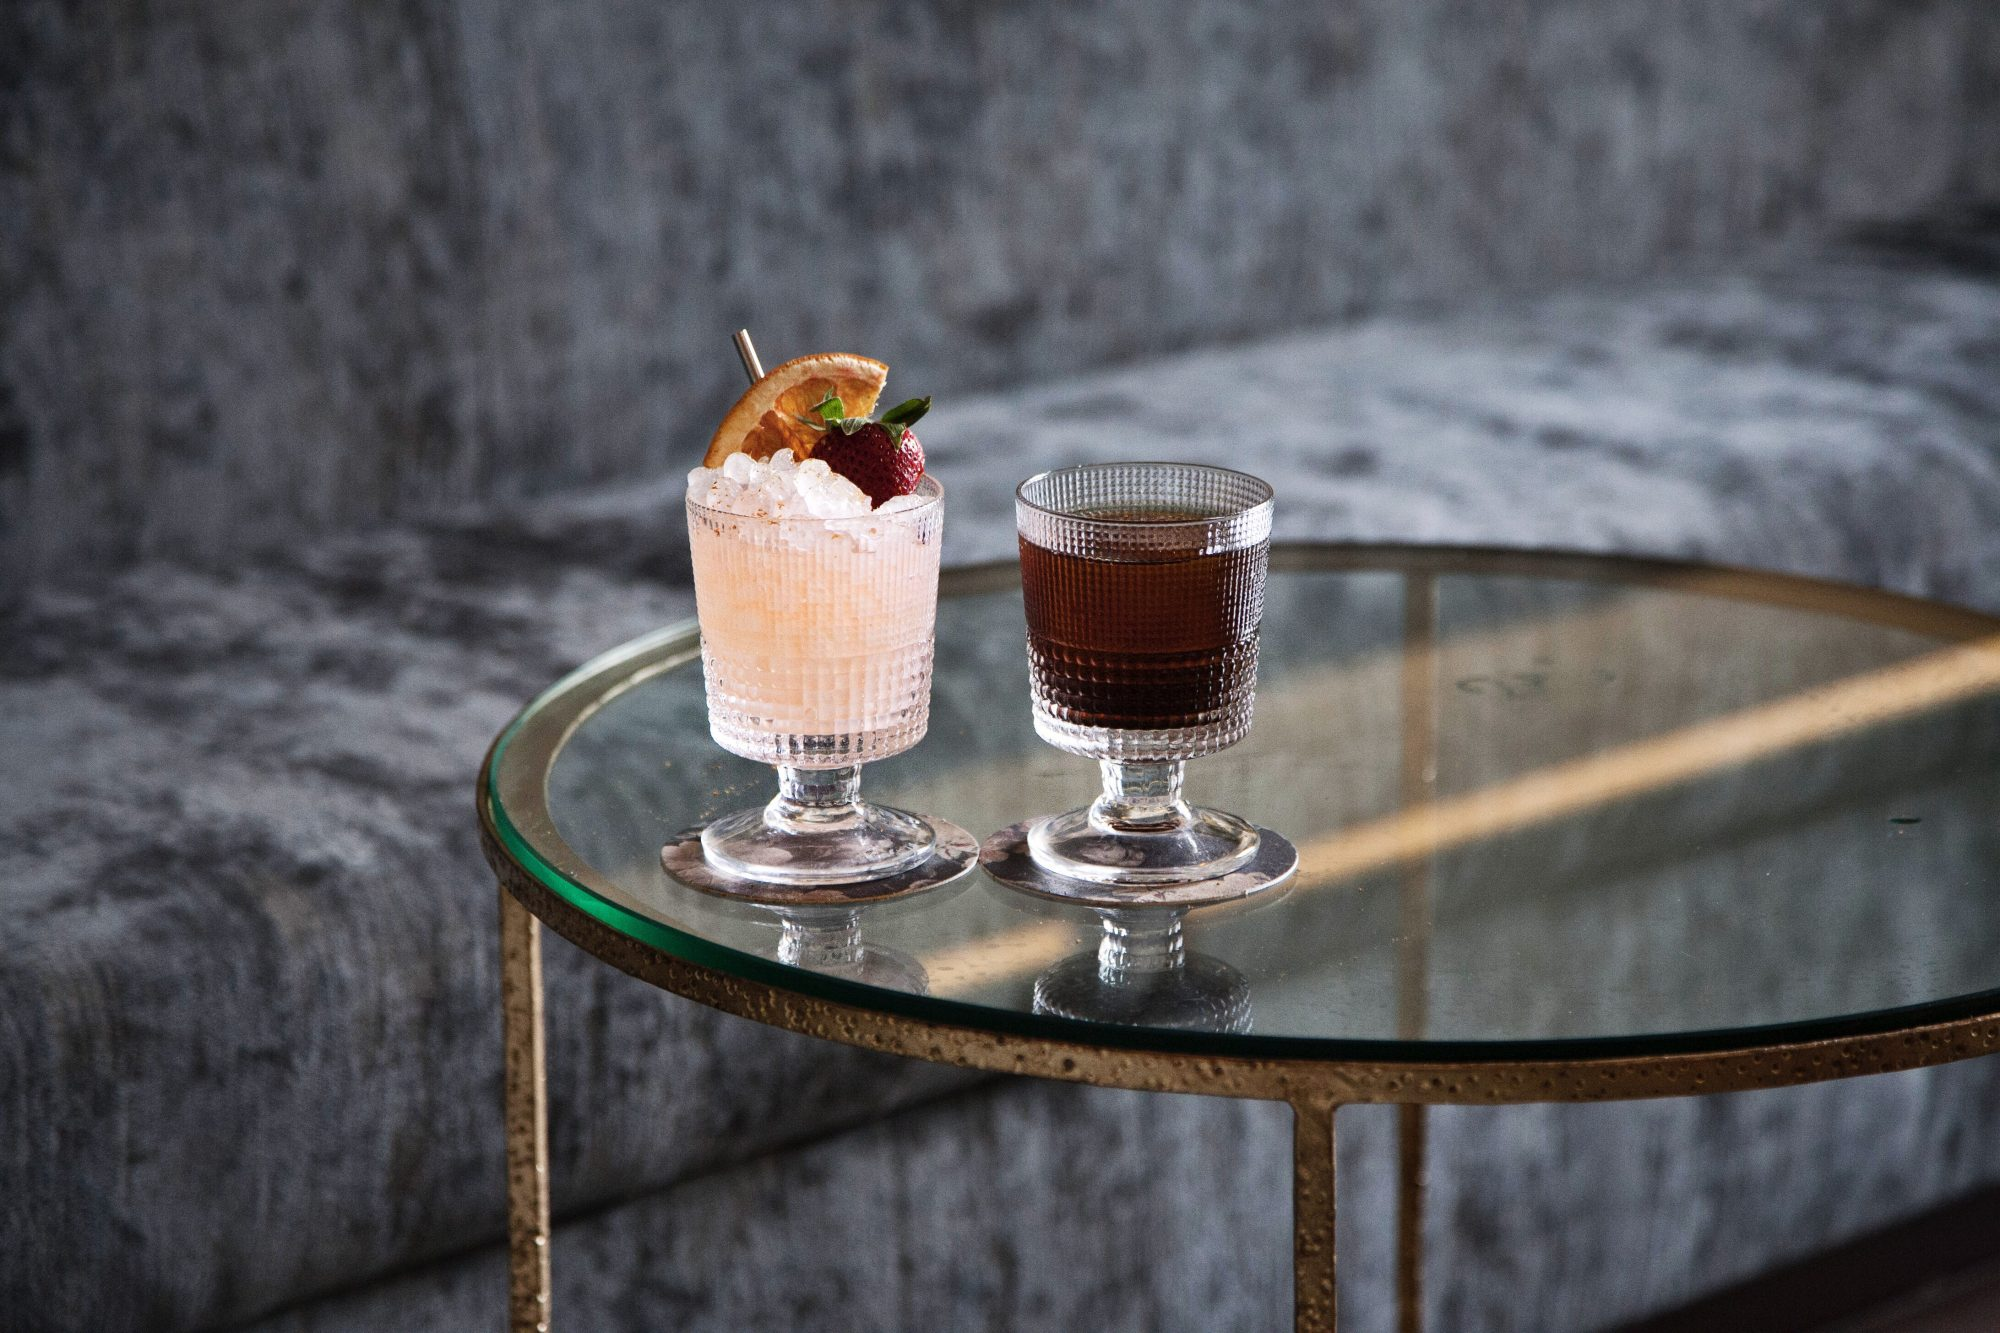 henley-eclipse-cocktails-image-2